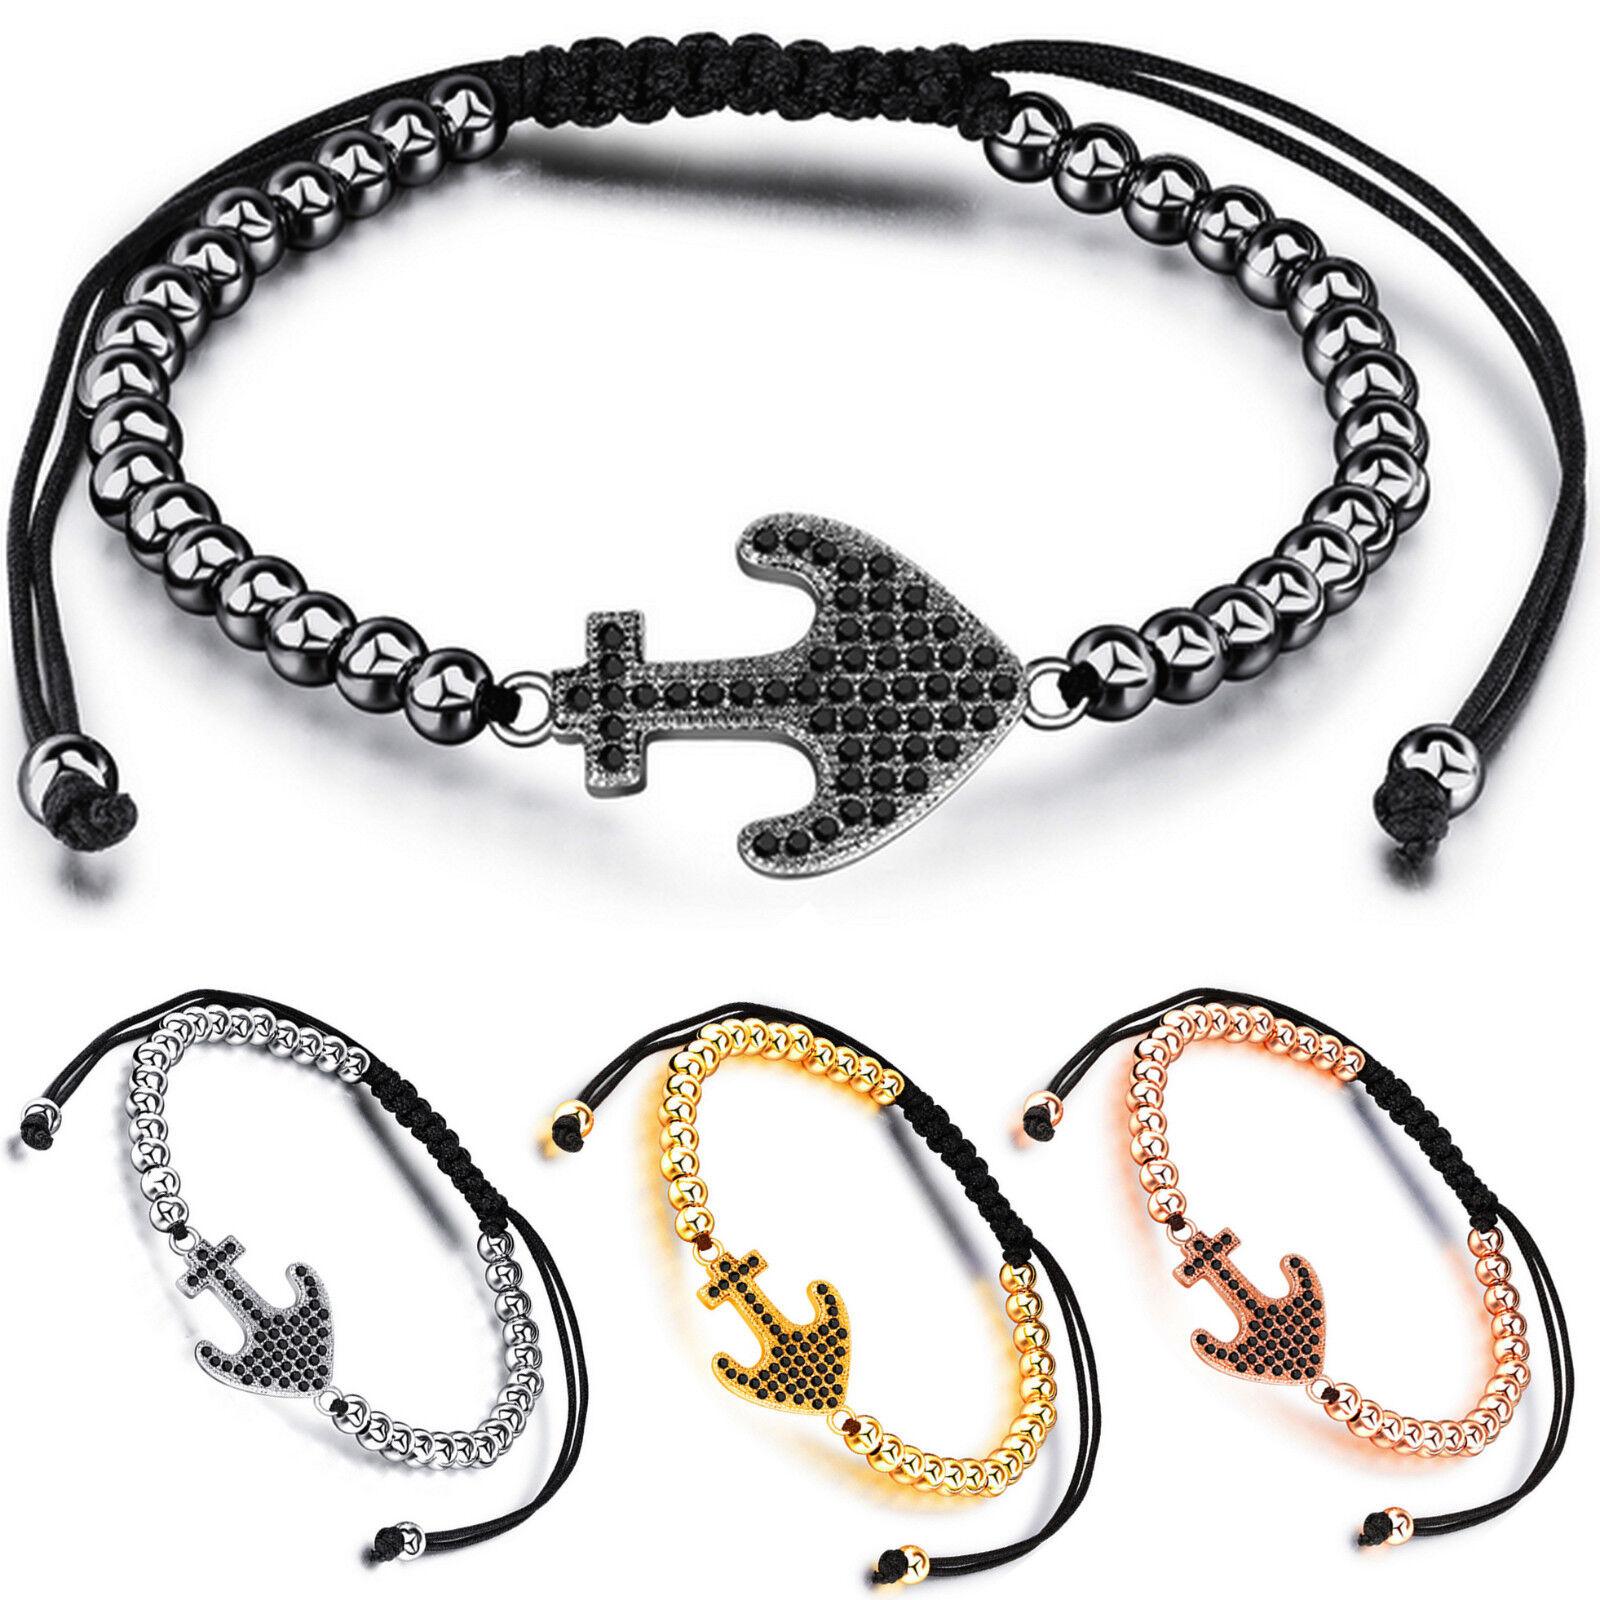 Women's Bracelet, Stainless Steel Beads and Cubic Zirconia Anchor Bracelet Bracelets